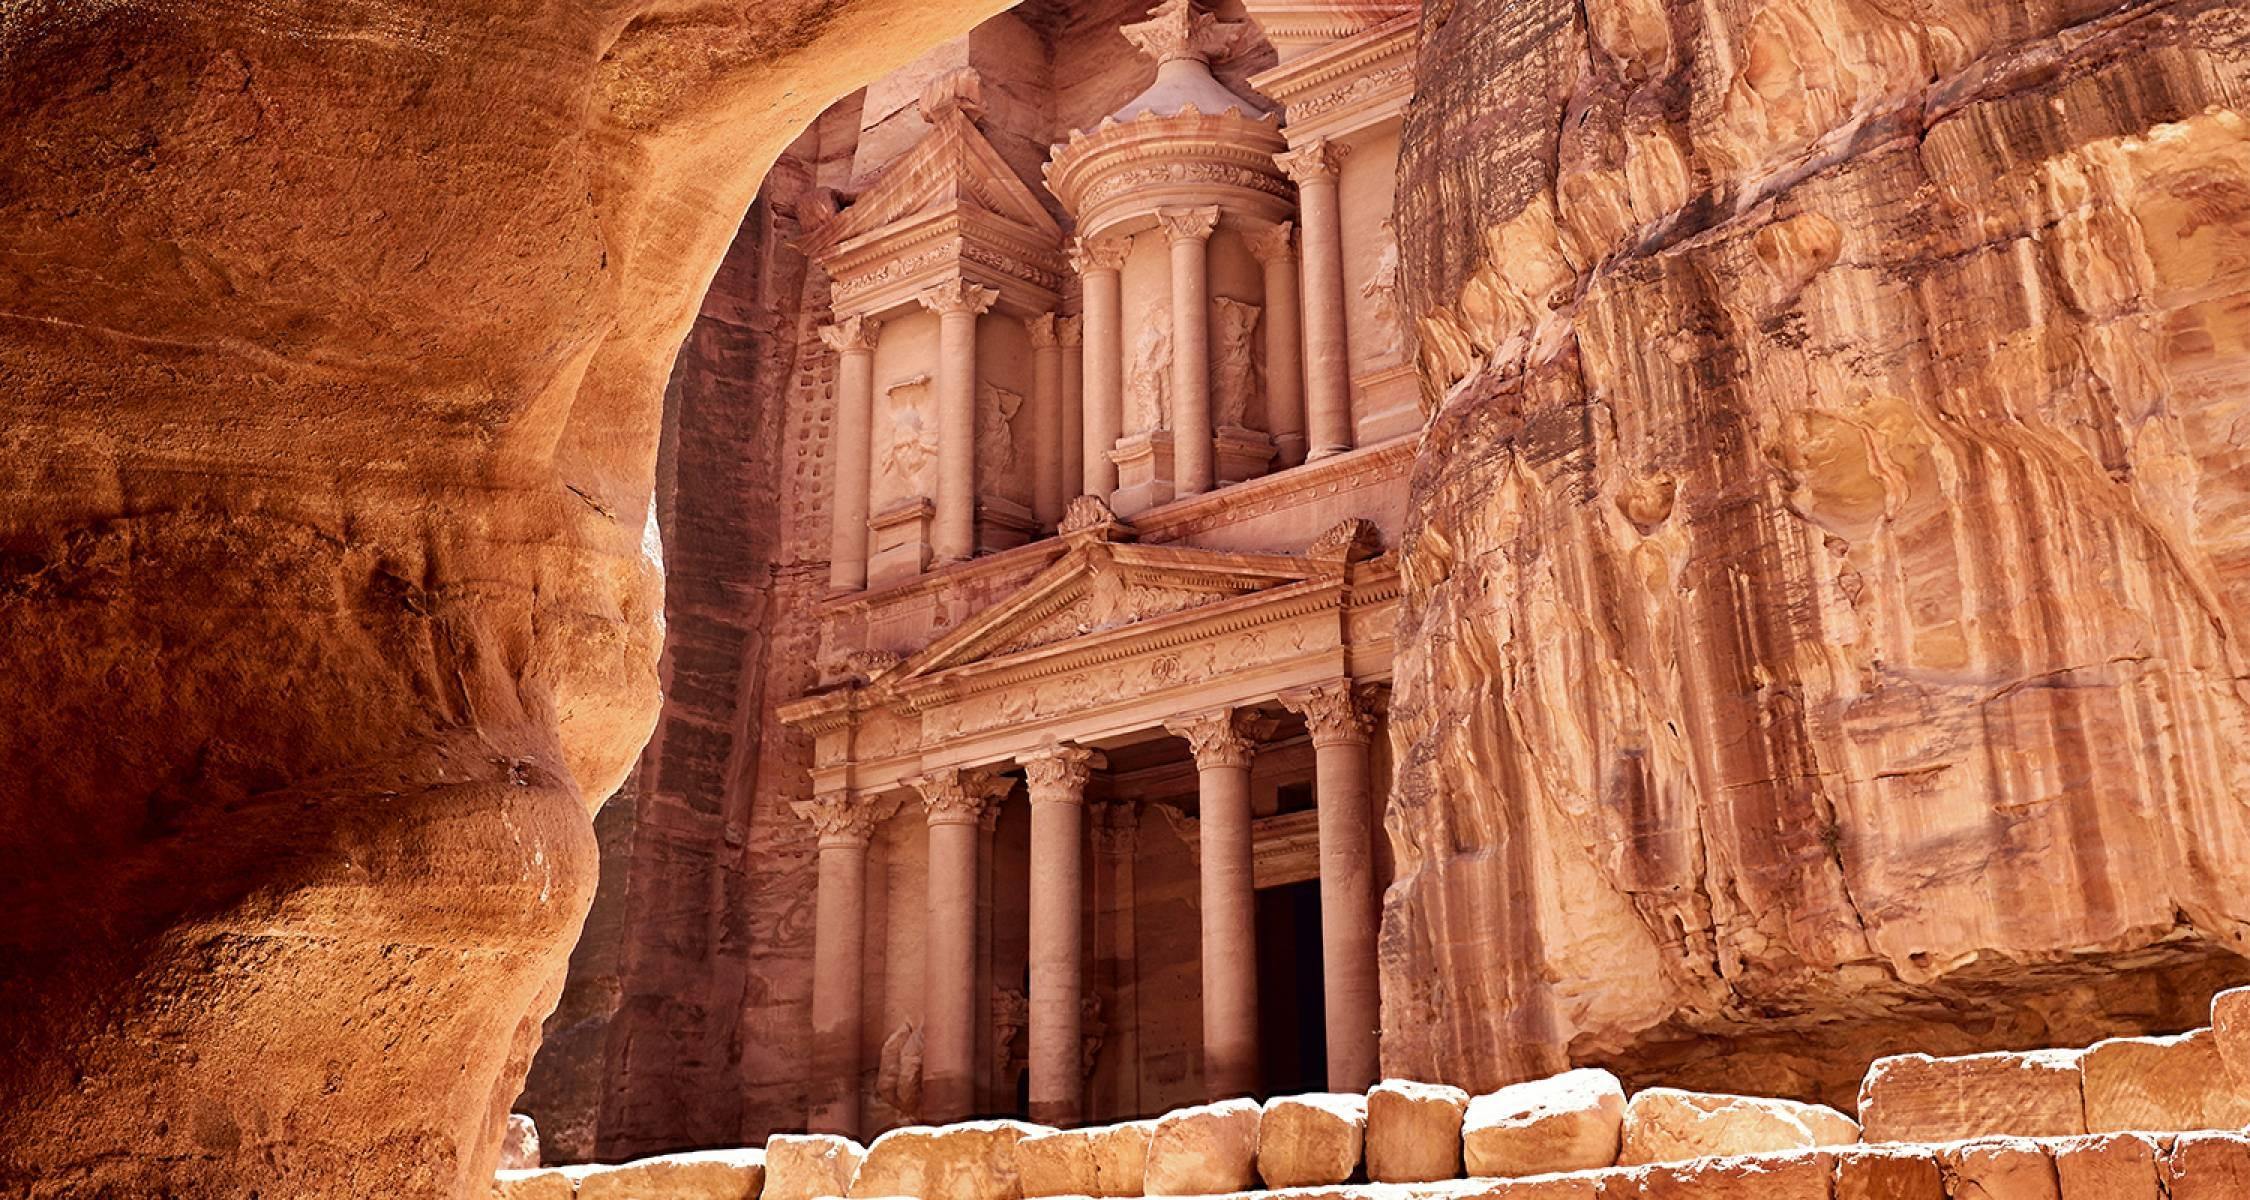 Road To Jordan - 16 days